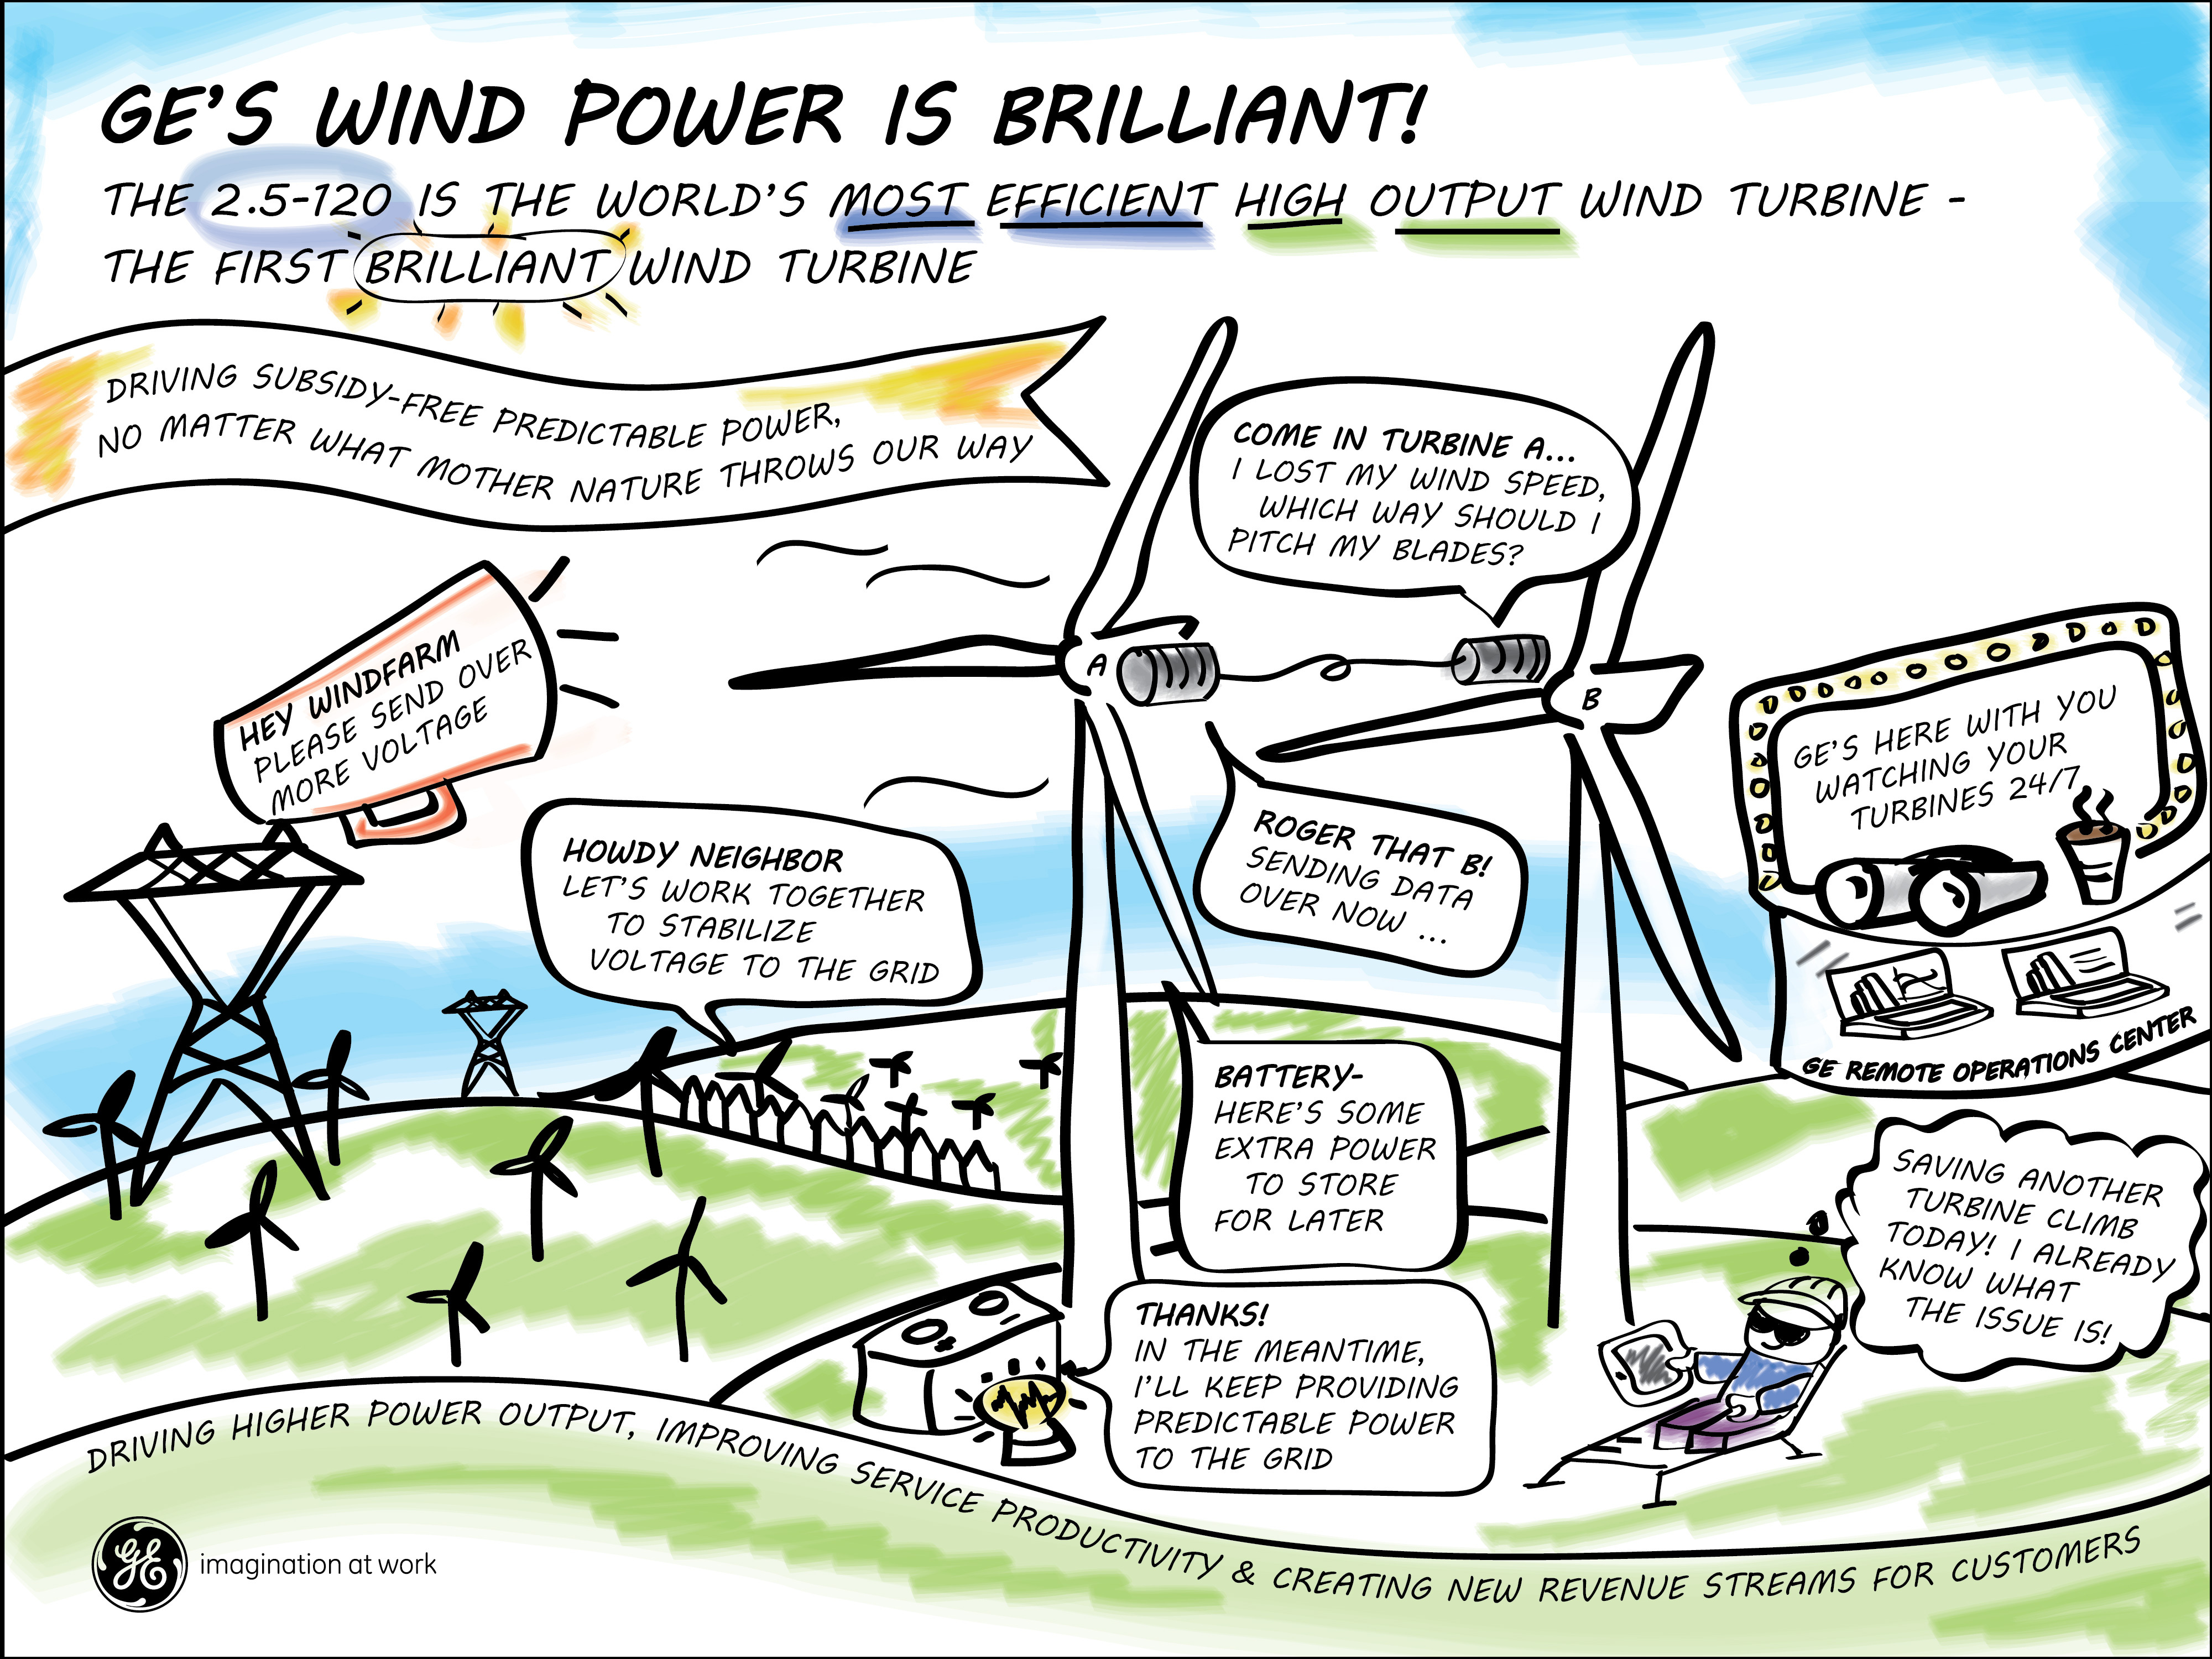 GE 2.5-120 Brilliant wind turbine